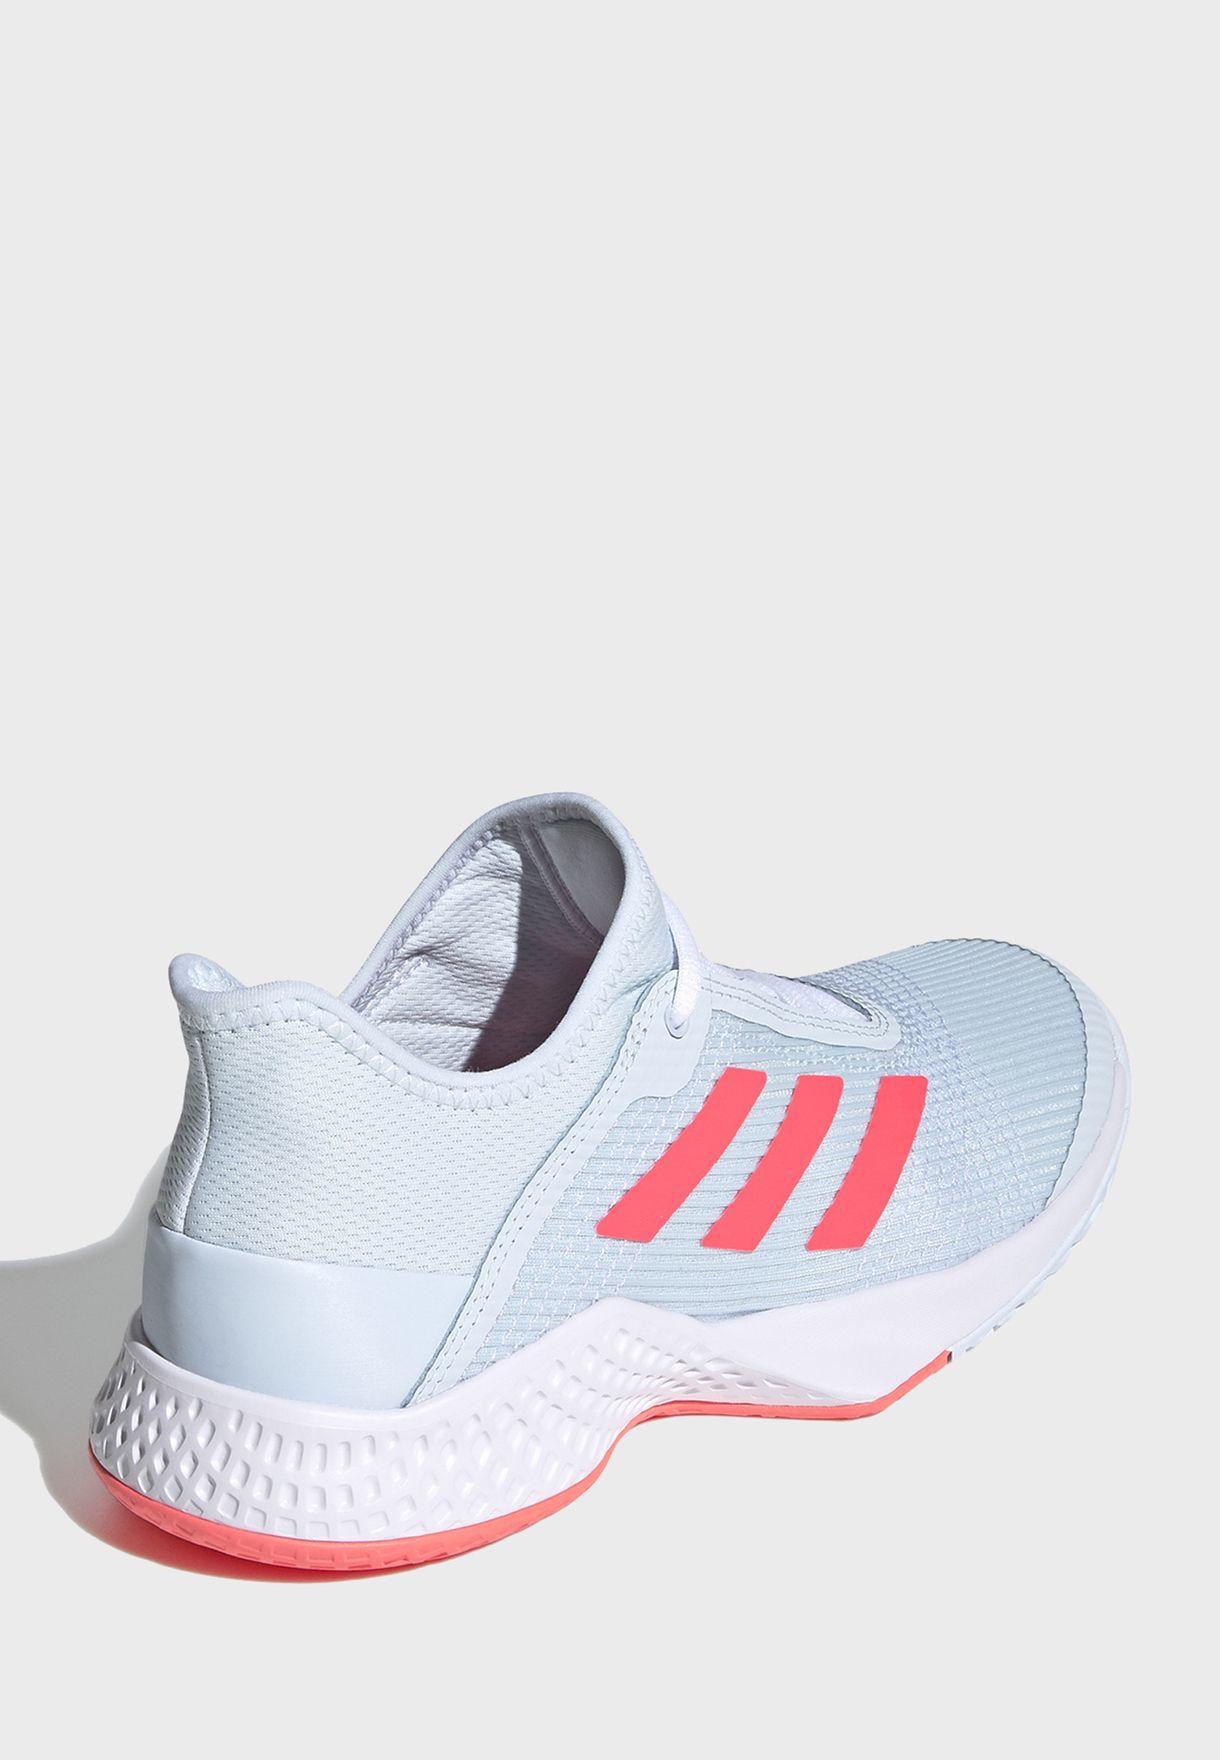 Adizero Club Sports Tennis Women's Shoes